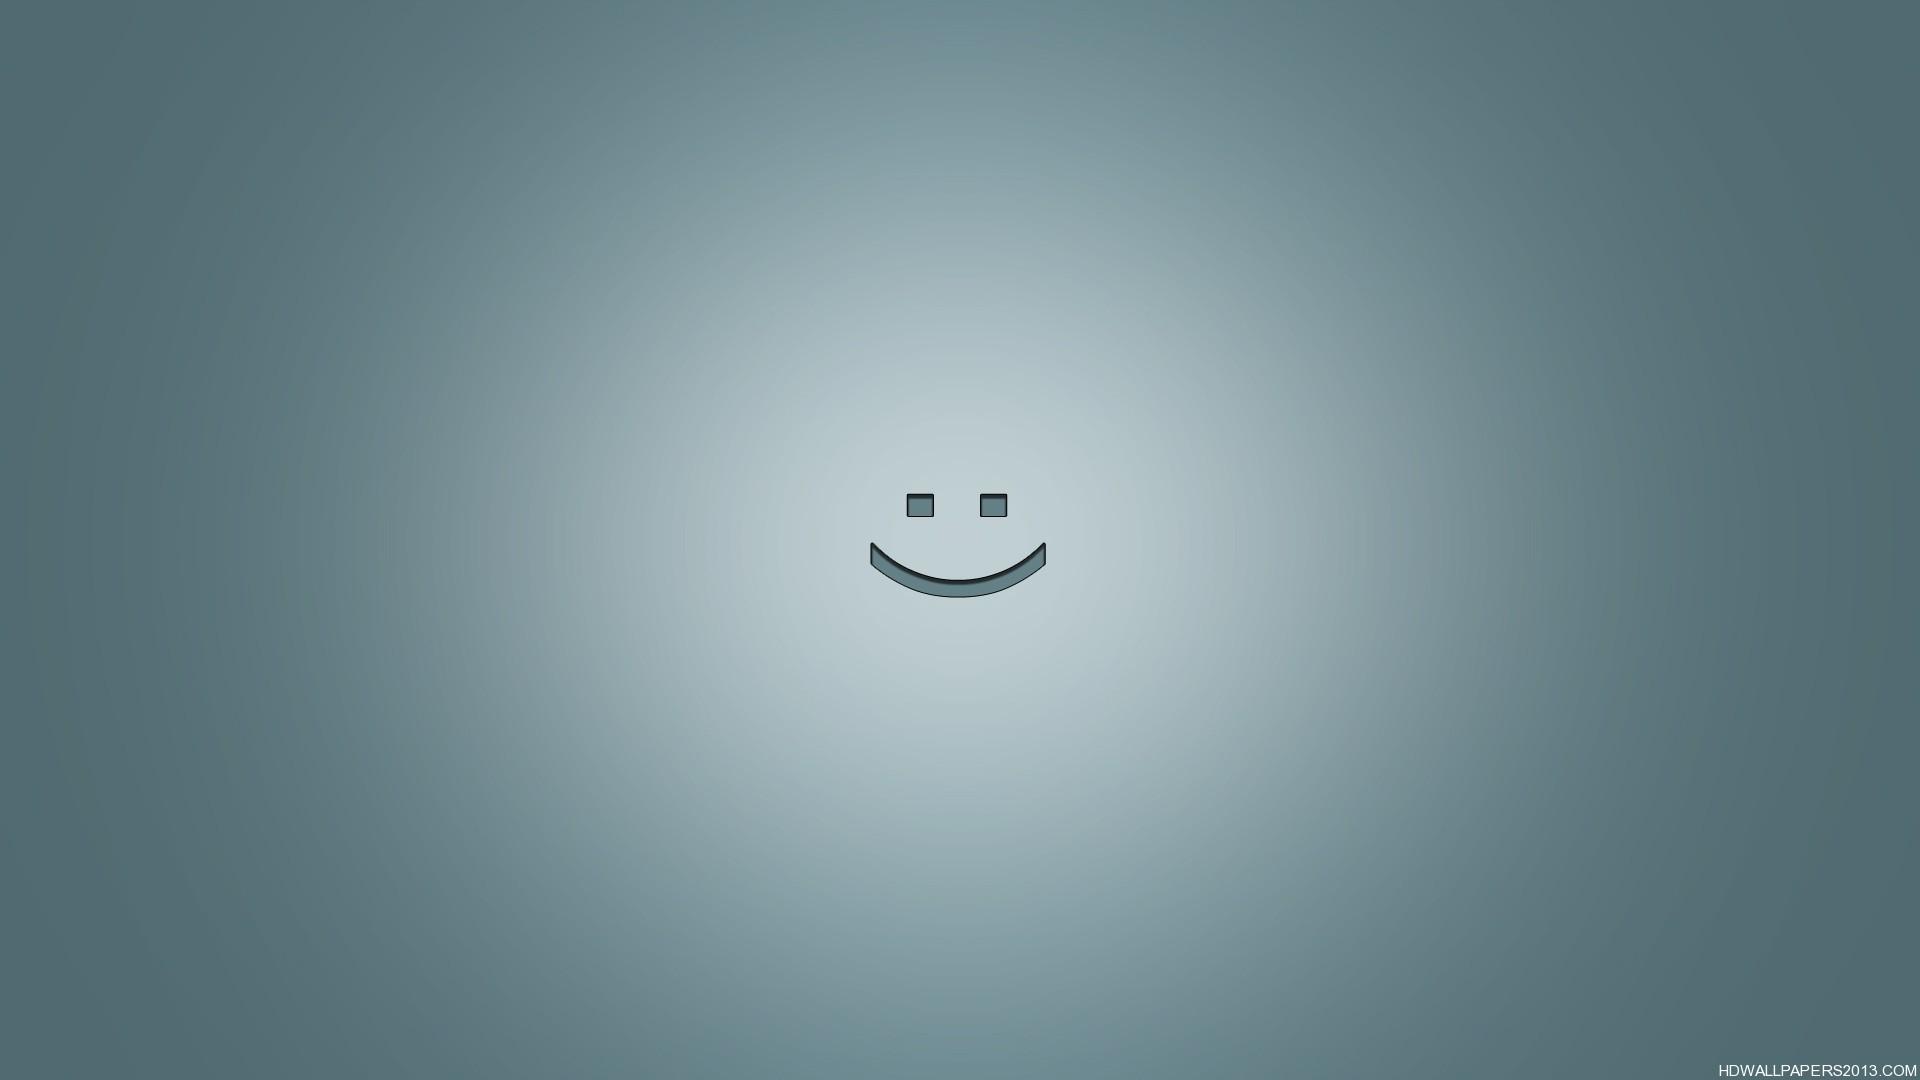 Smile More Wallpaper, Live Smile More Wallpapers, RCC Smile 1920×1080